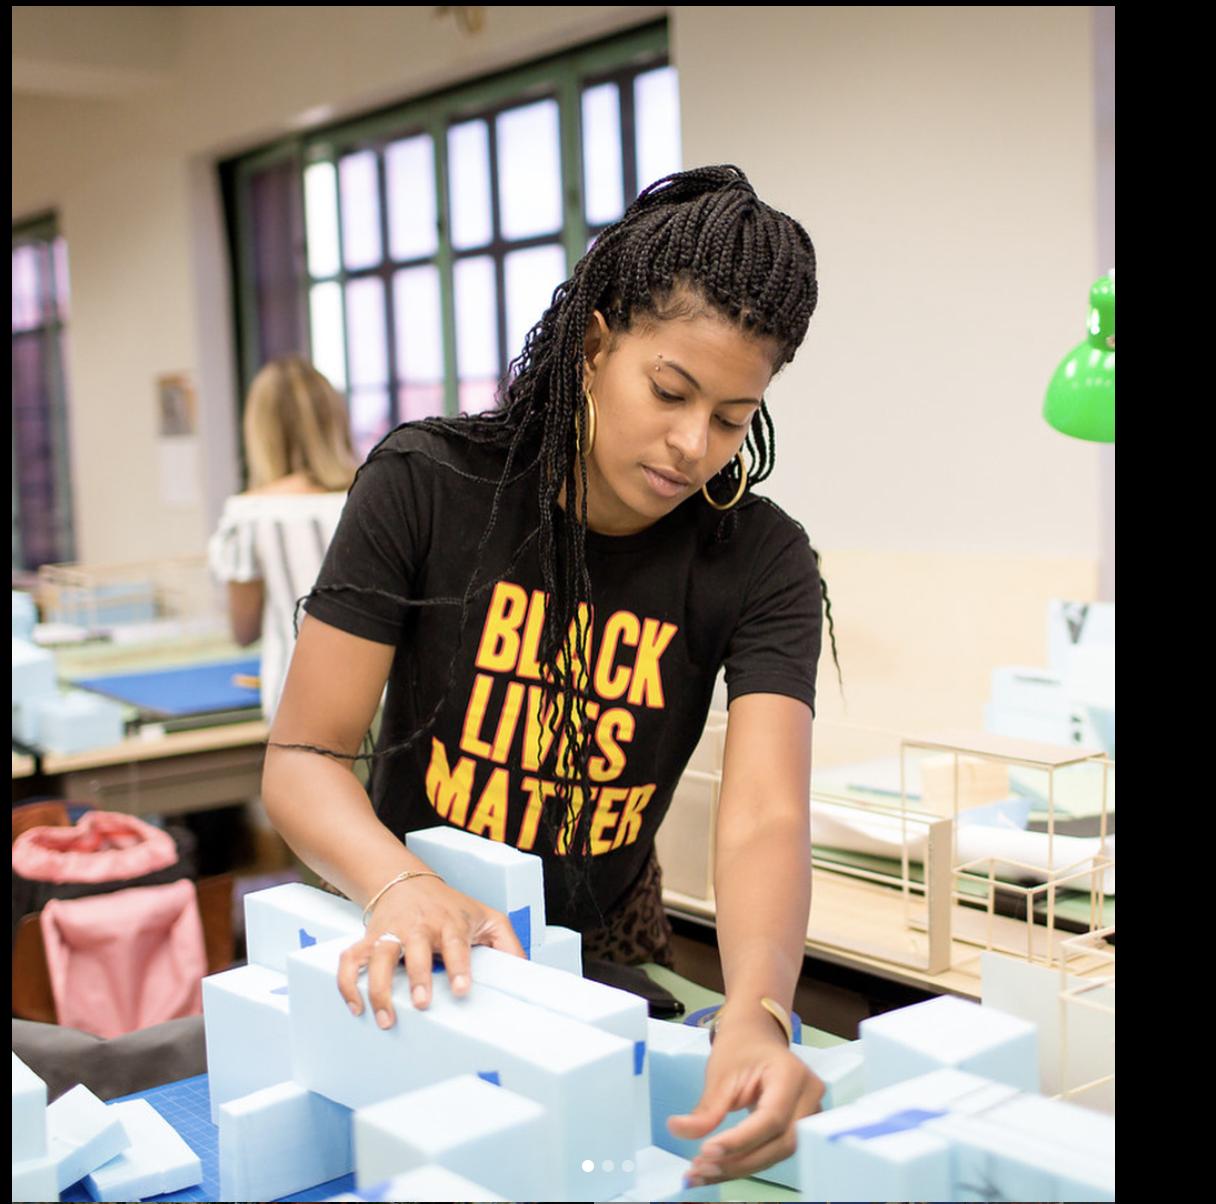 Taylor Davis working in studio wearing a Black Lives Matter shirt